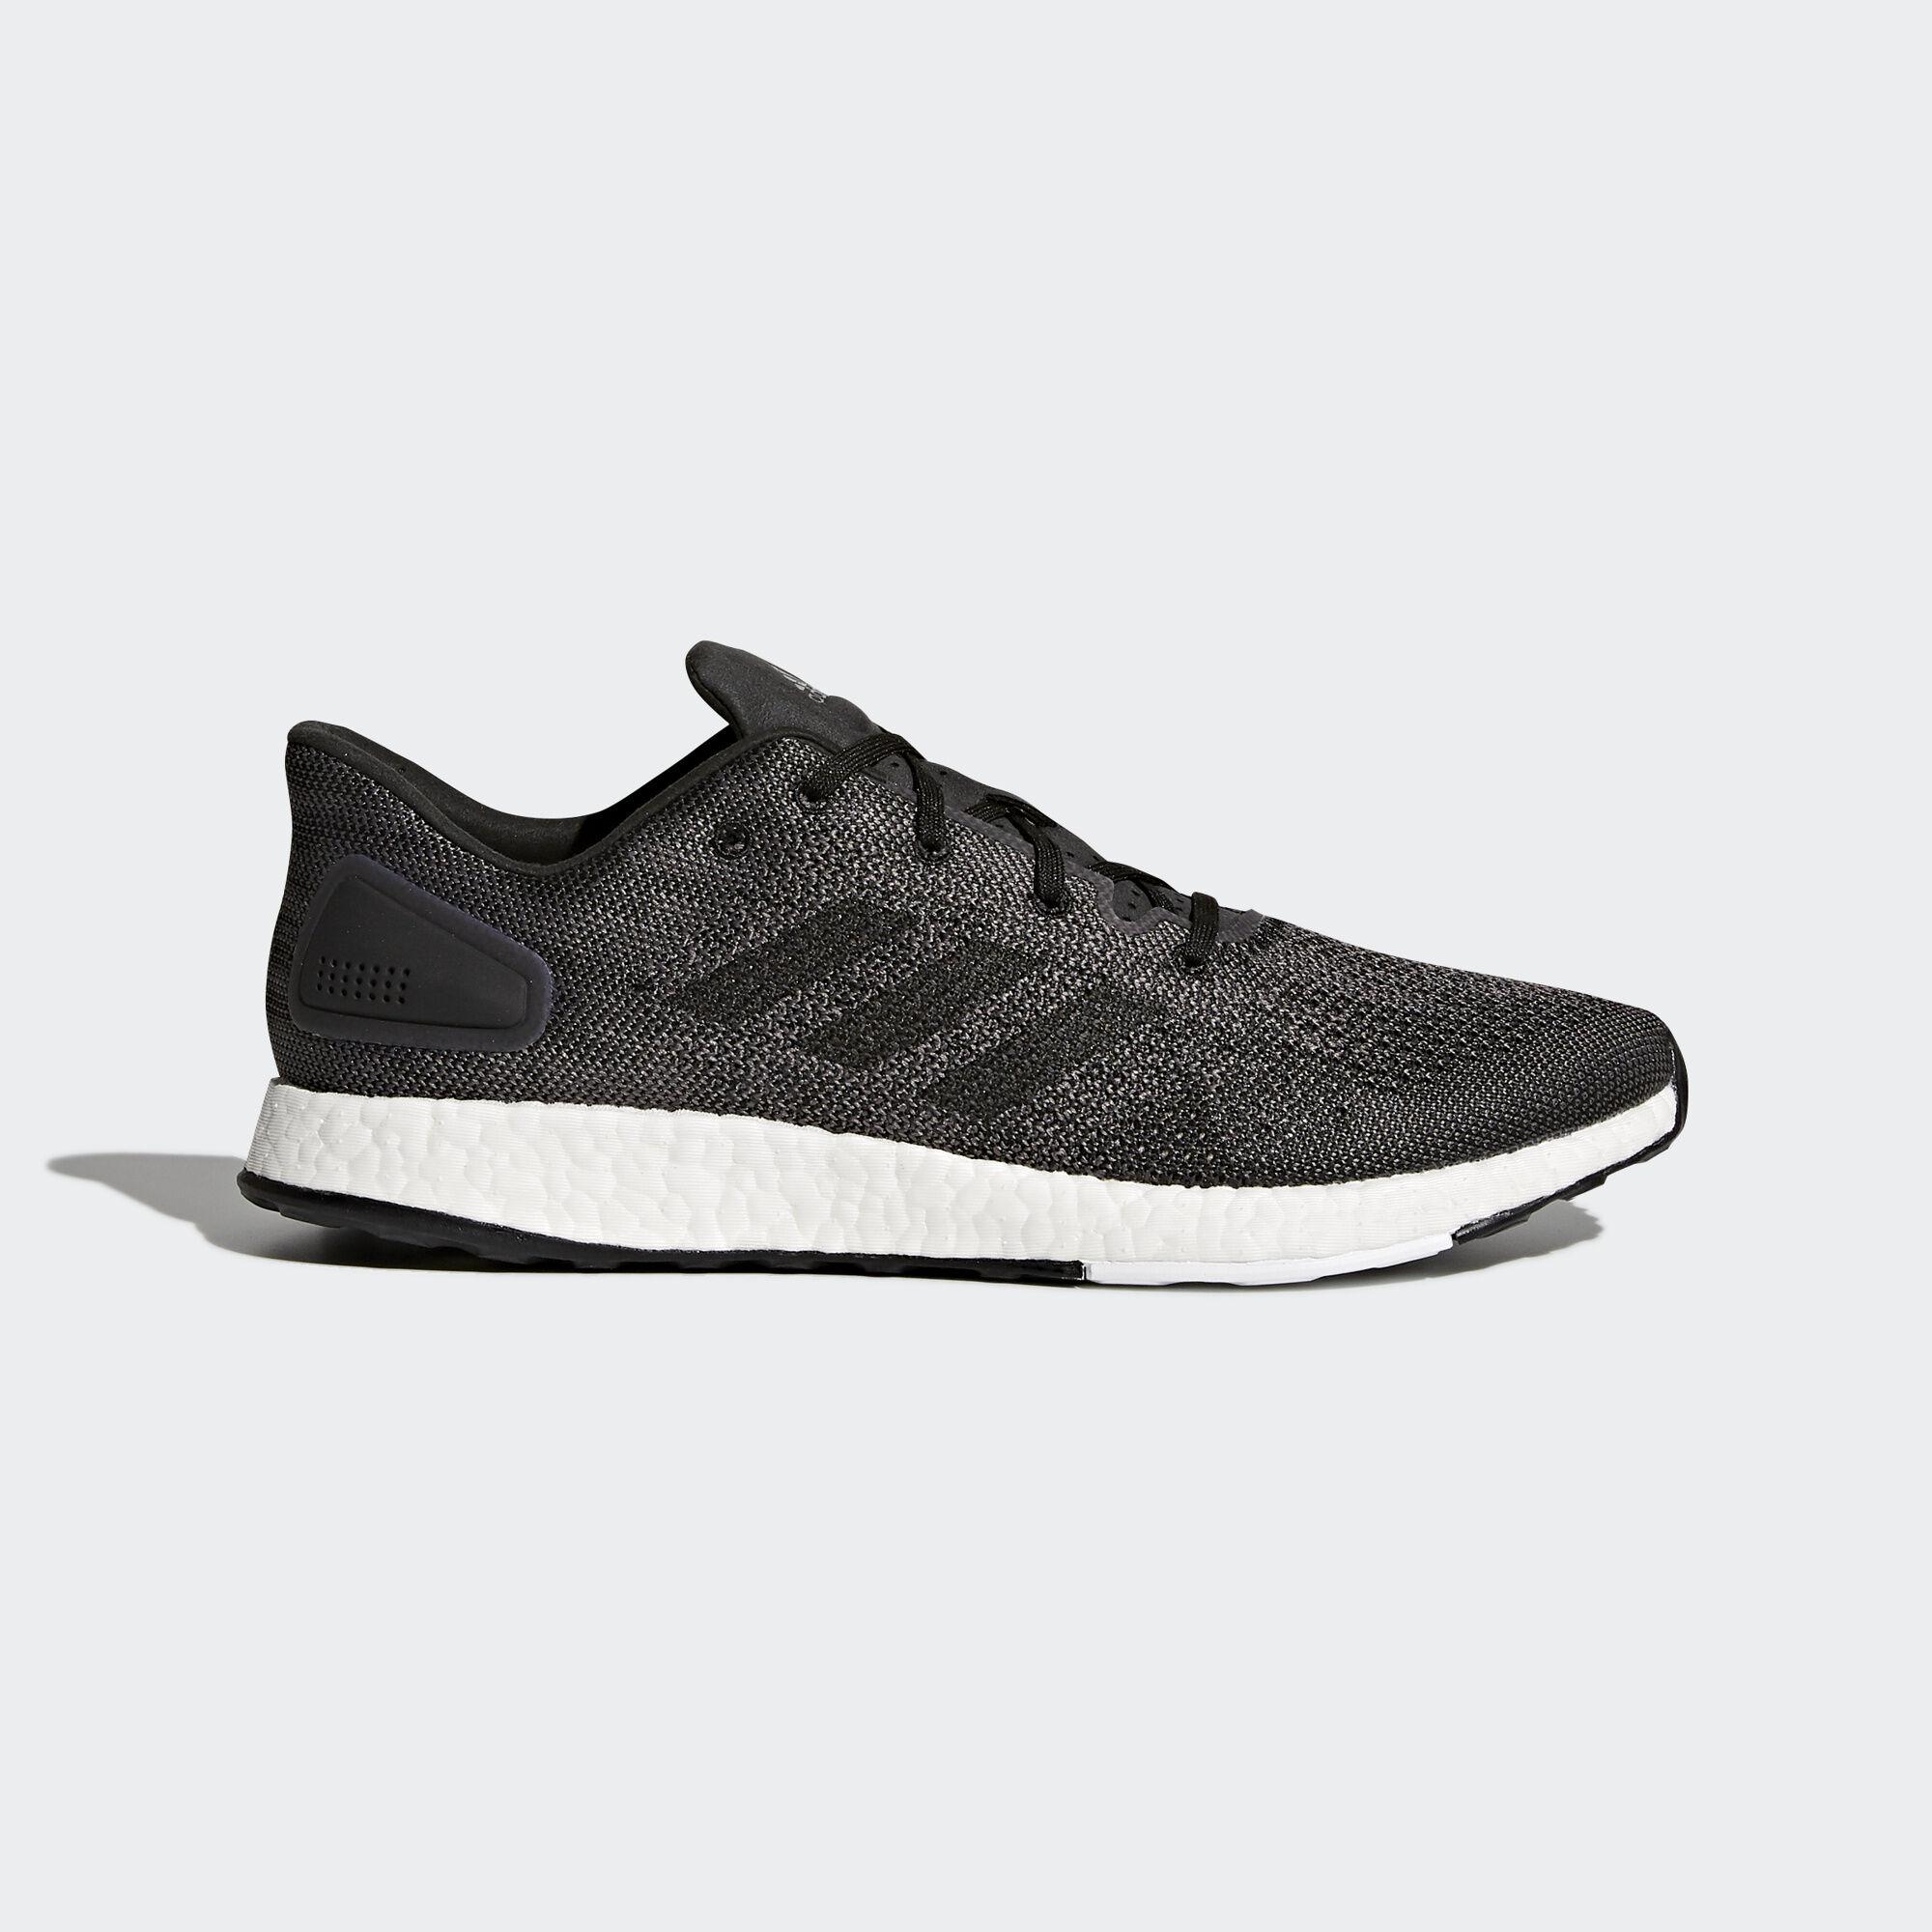 1802 adidas Pureboost DPR Men 's Training Running Shoes BB6290